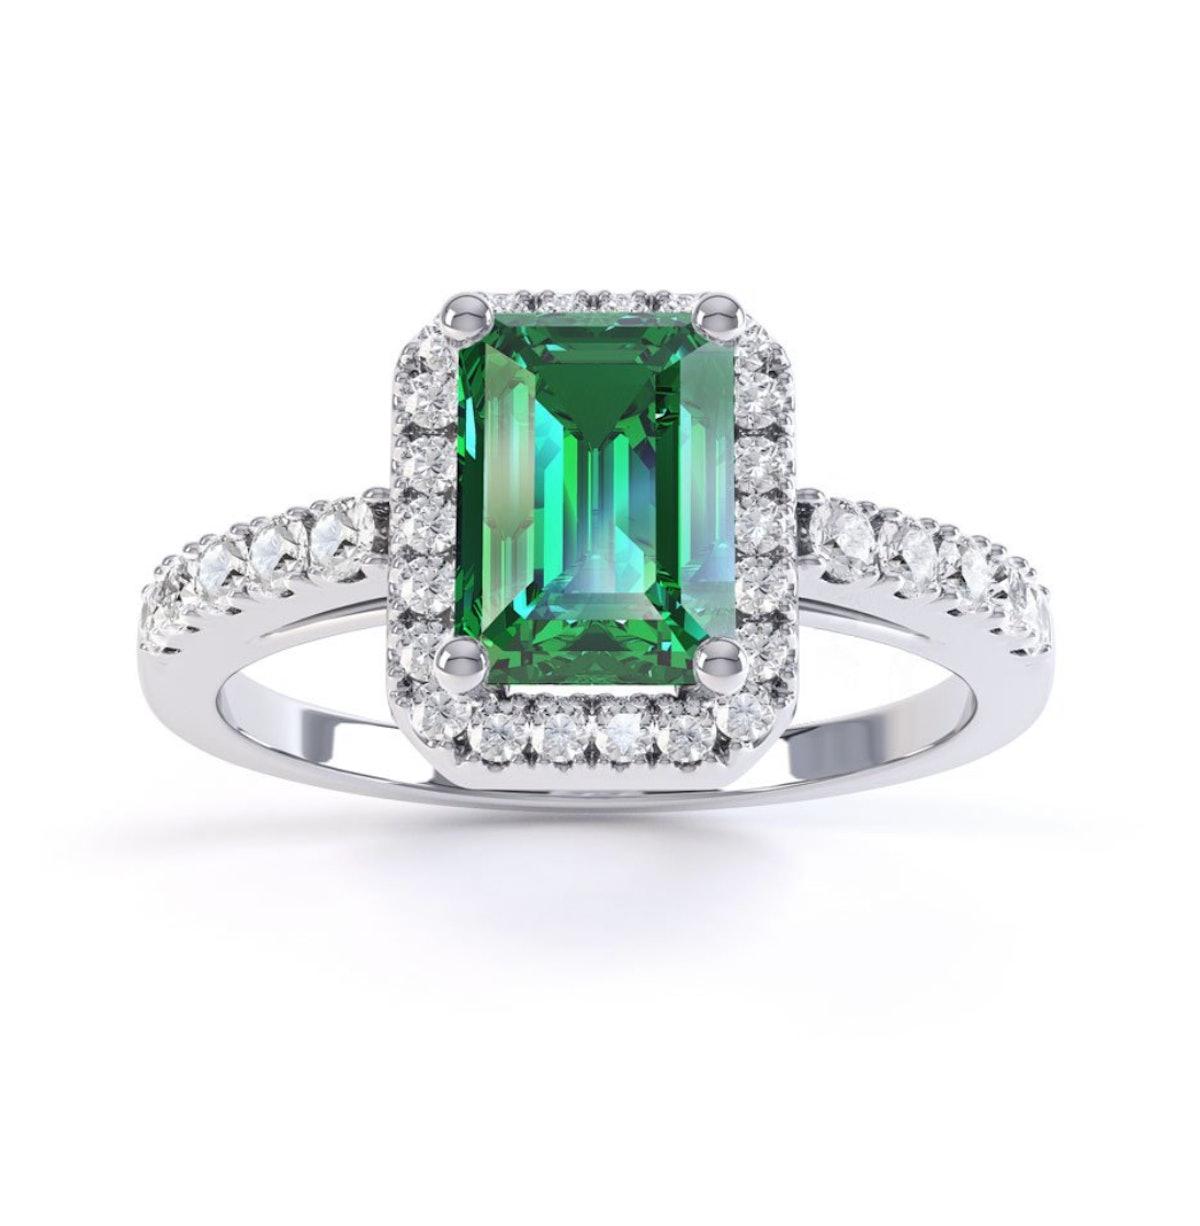 Princess Emerald Cut Emerald Halo 10K White Gold Engagement Ring